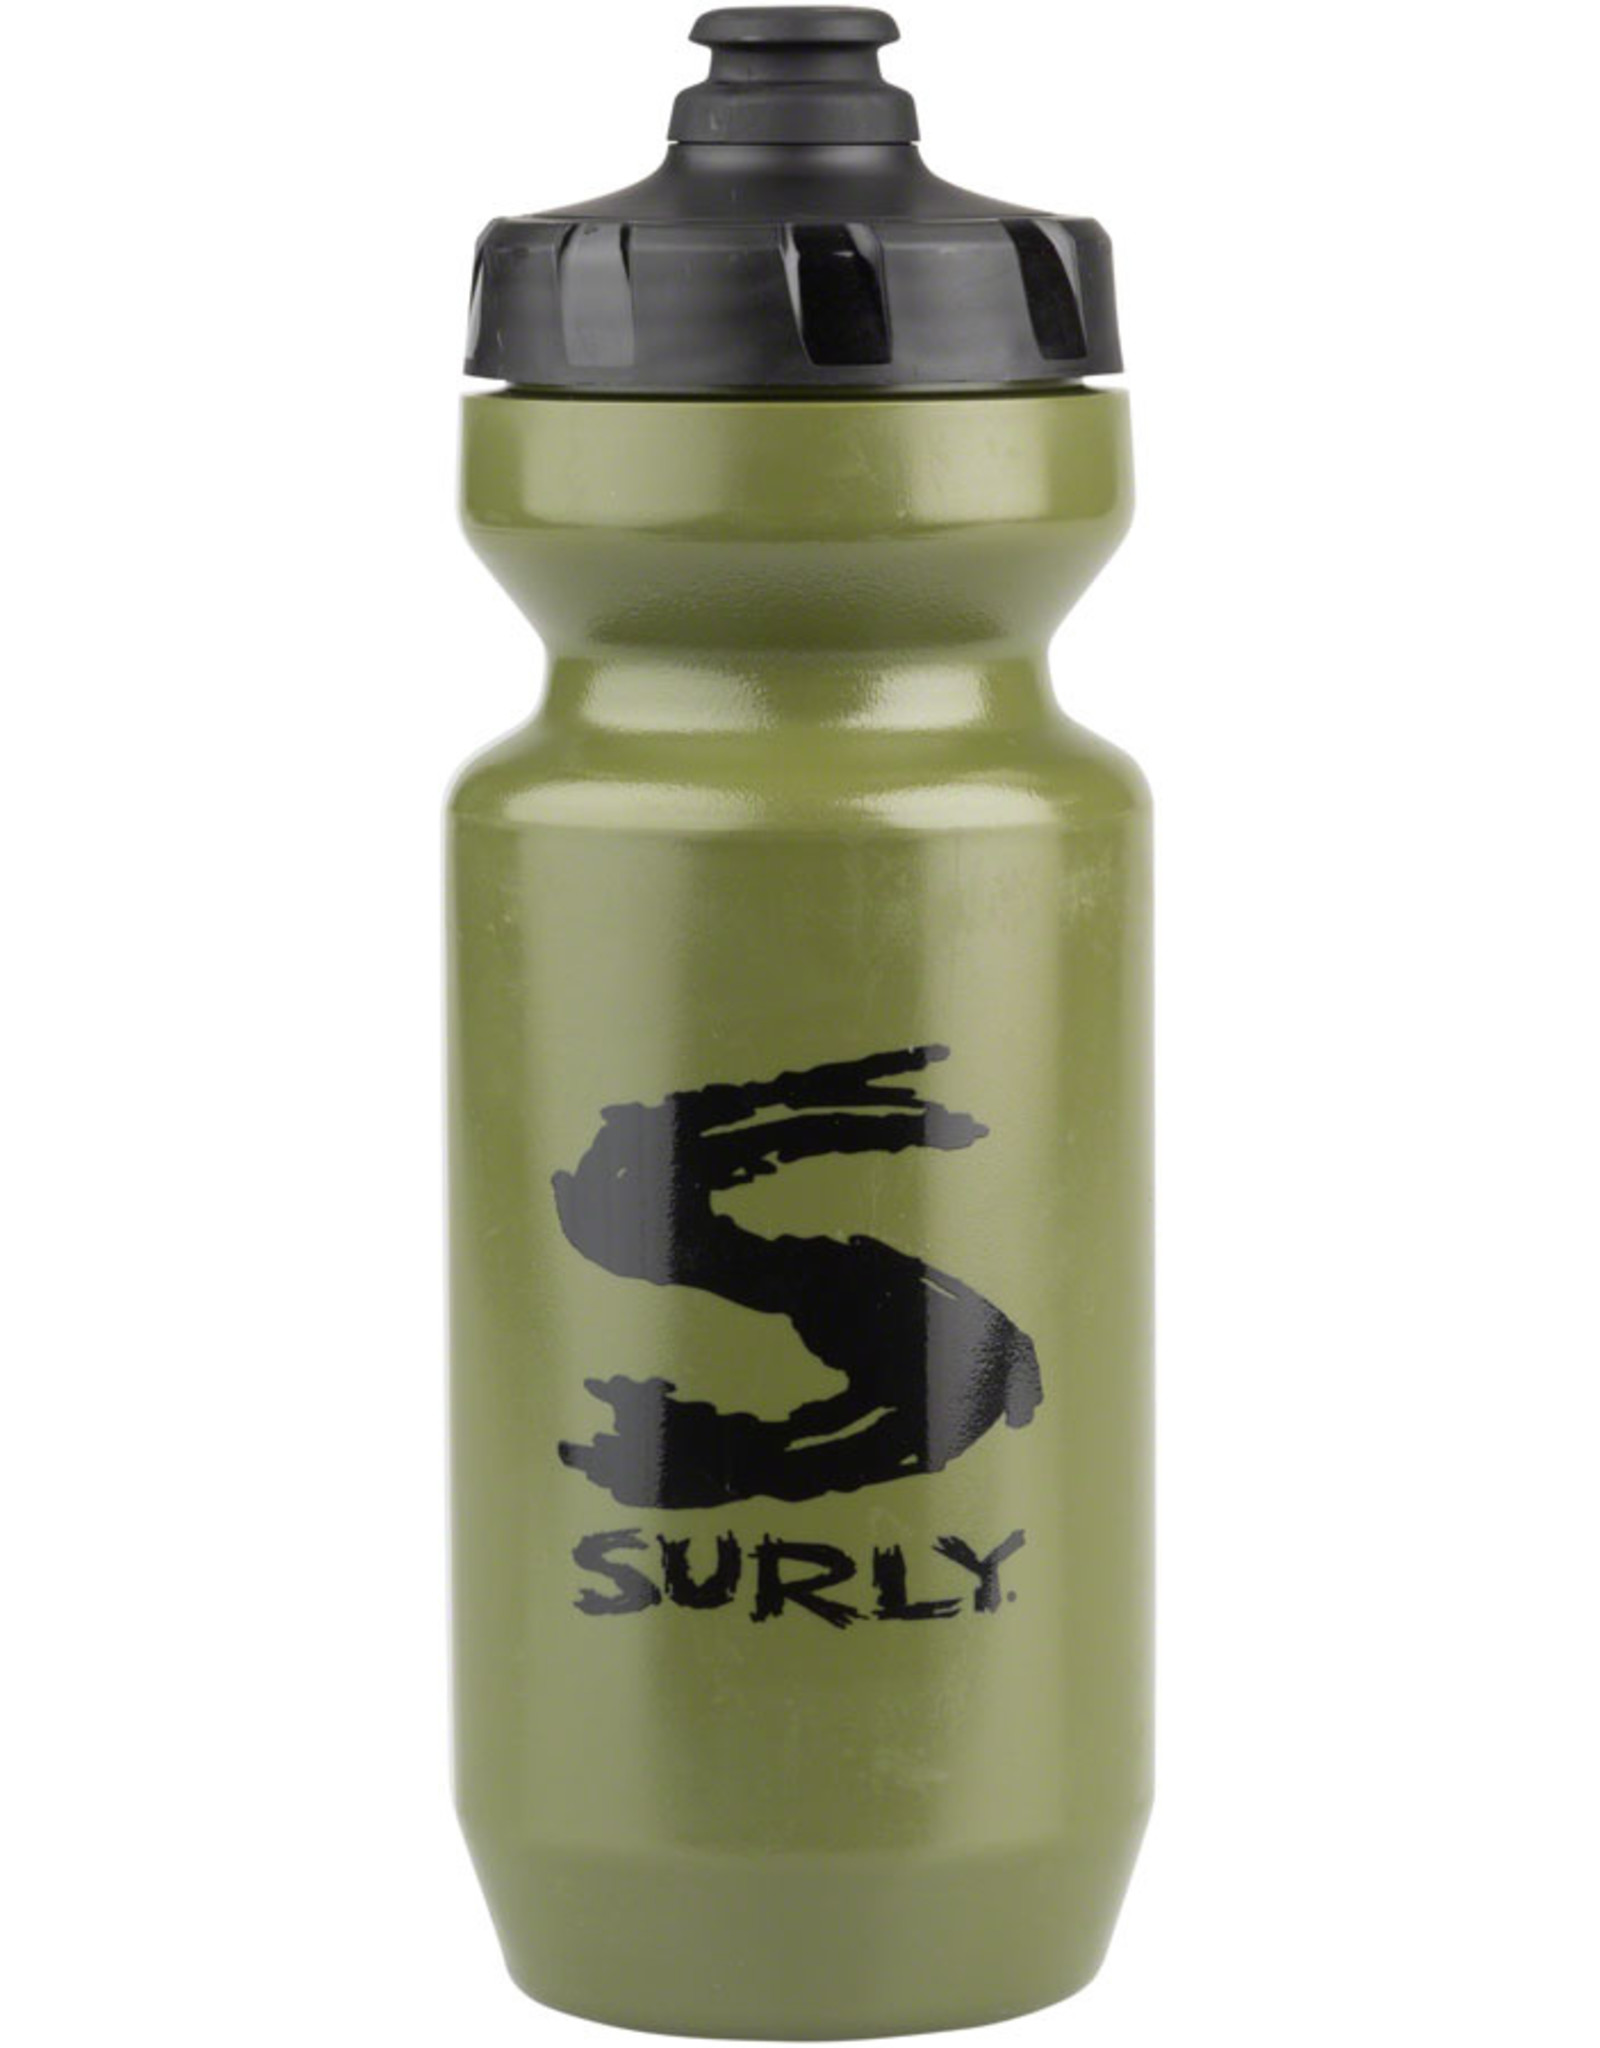 Surly Surly Big S Purist Water Bottle Green, Black 22oz